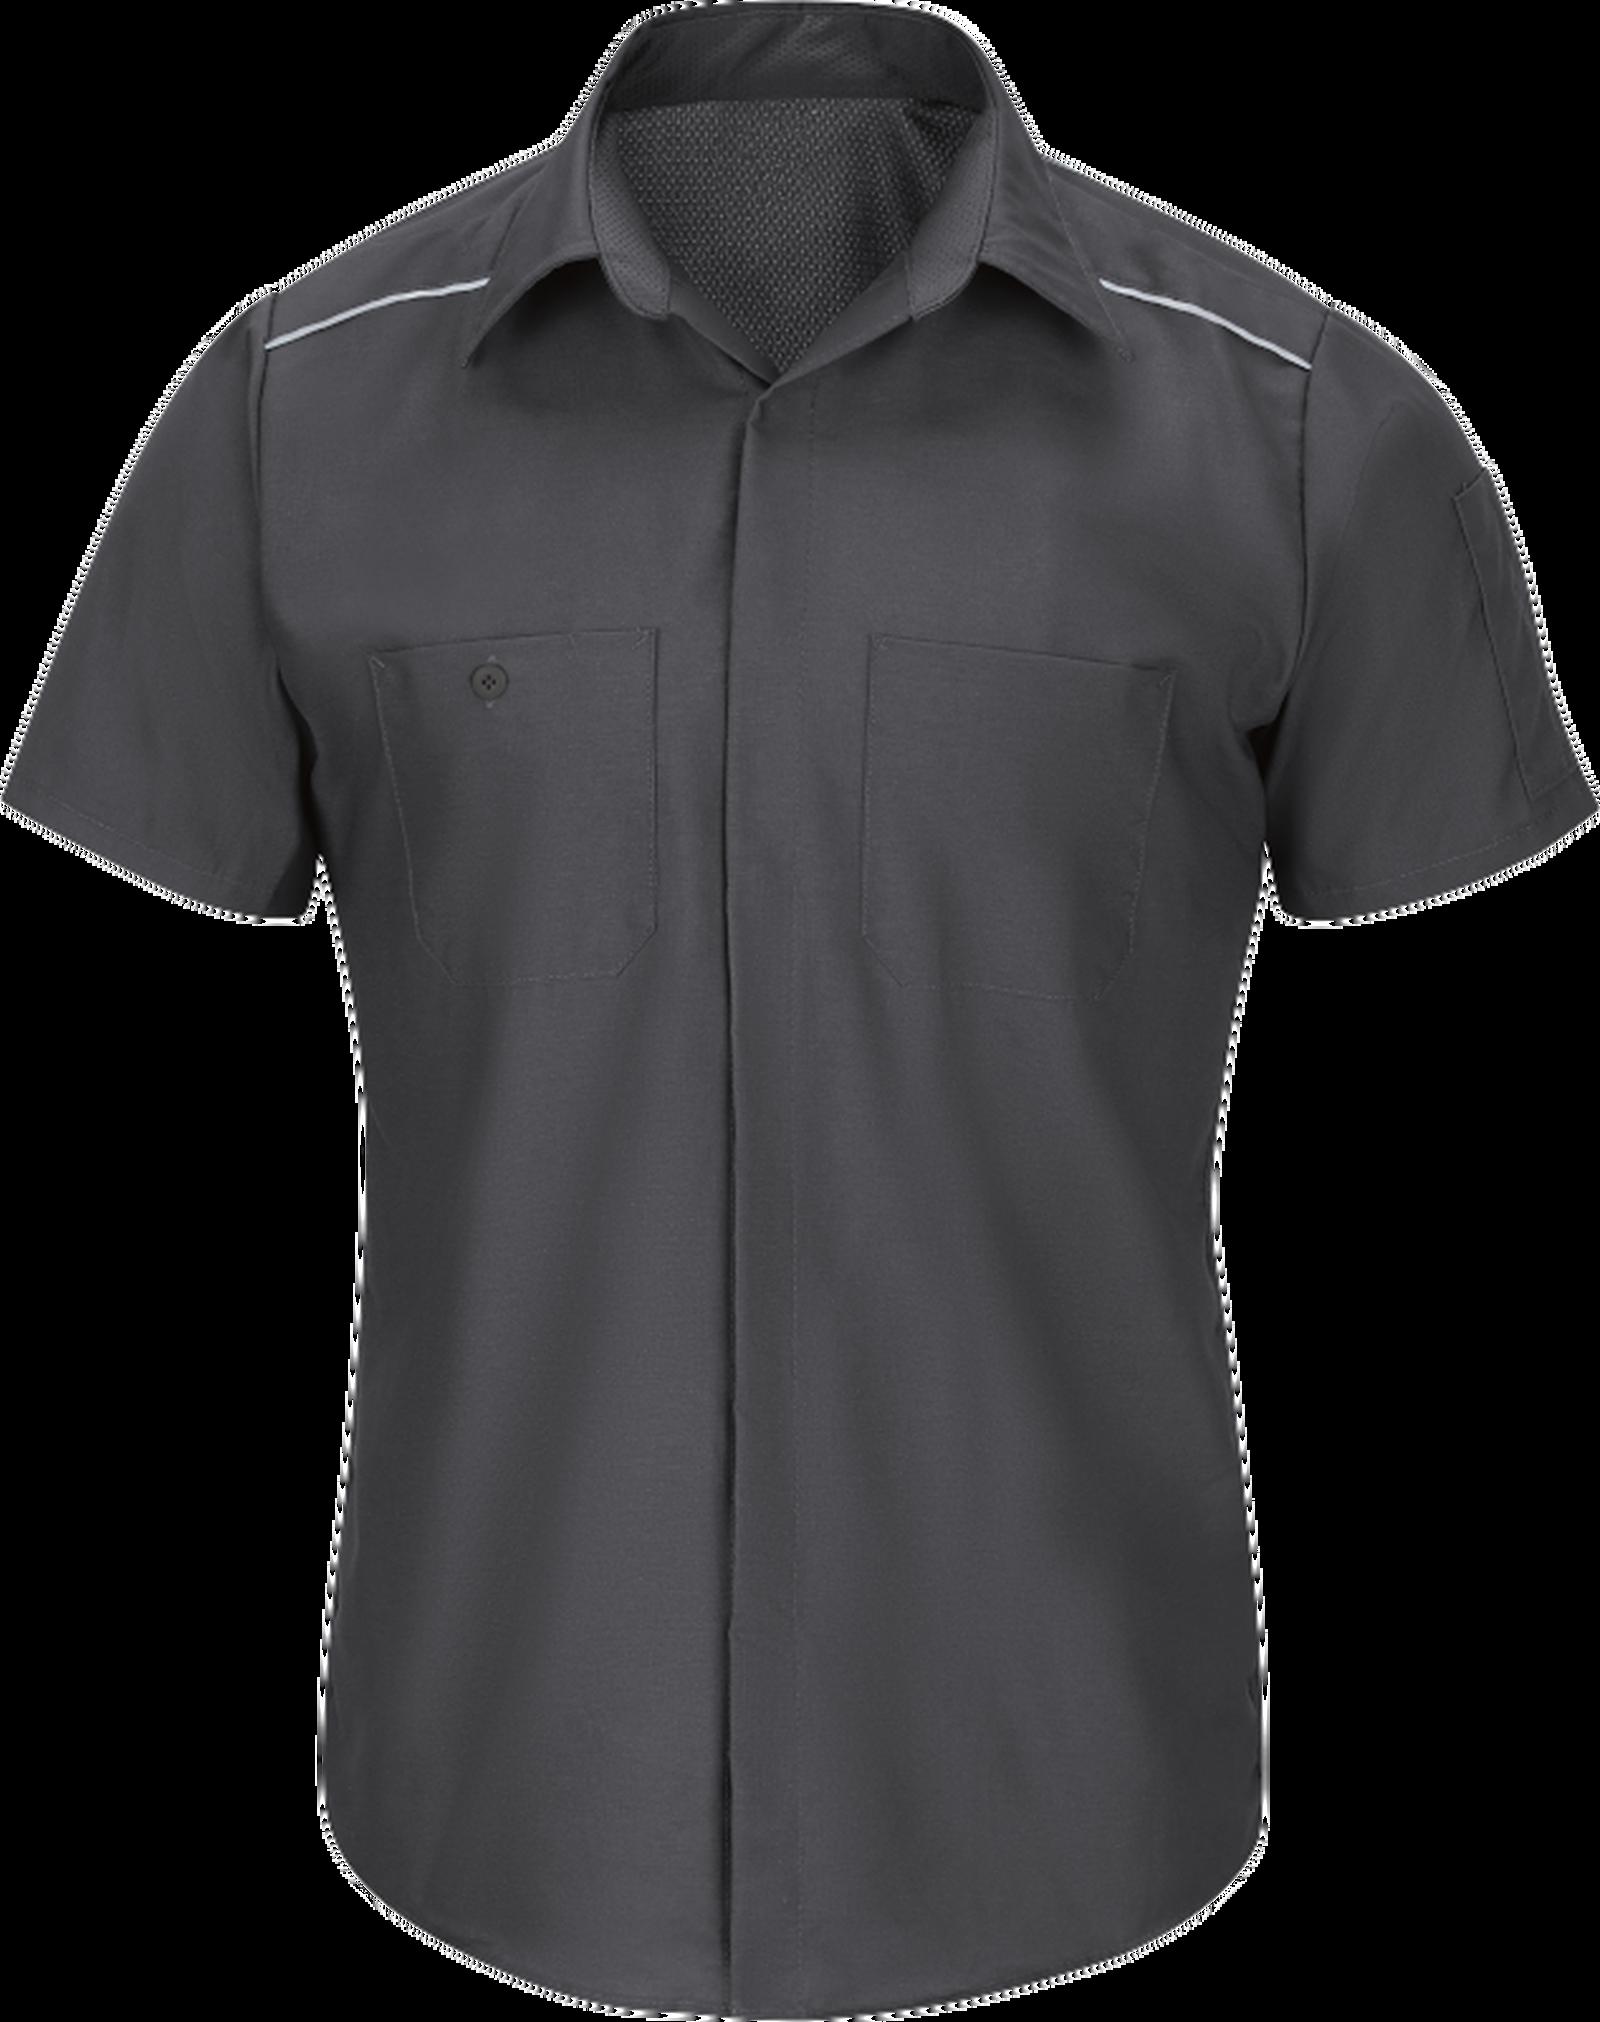 Men's Short Sleeve Pro Airflow Work Shirt